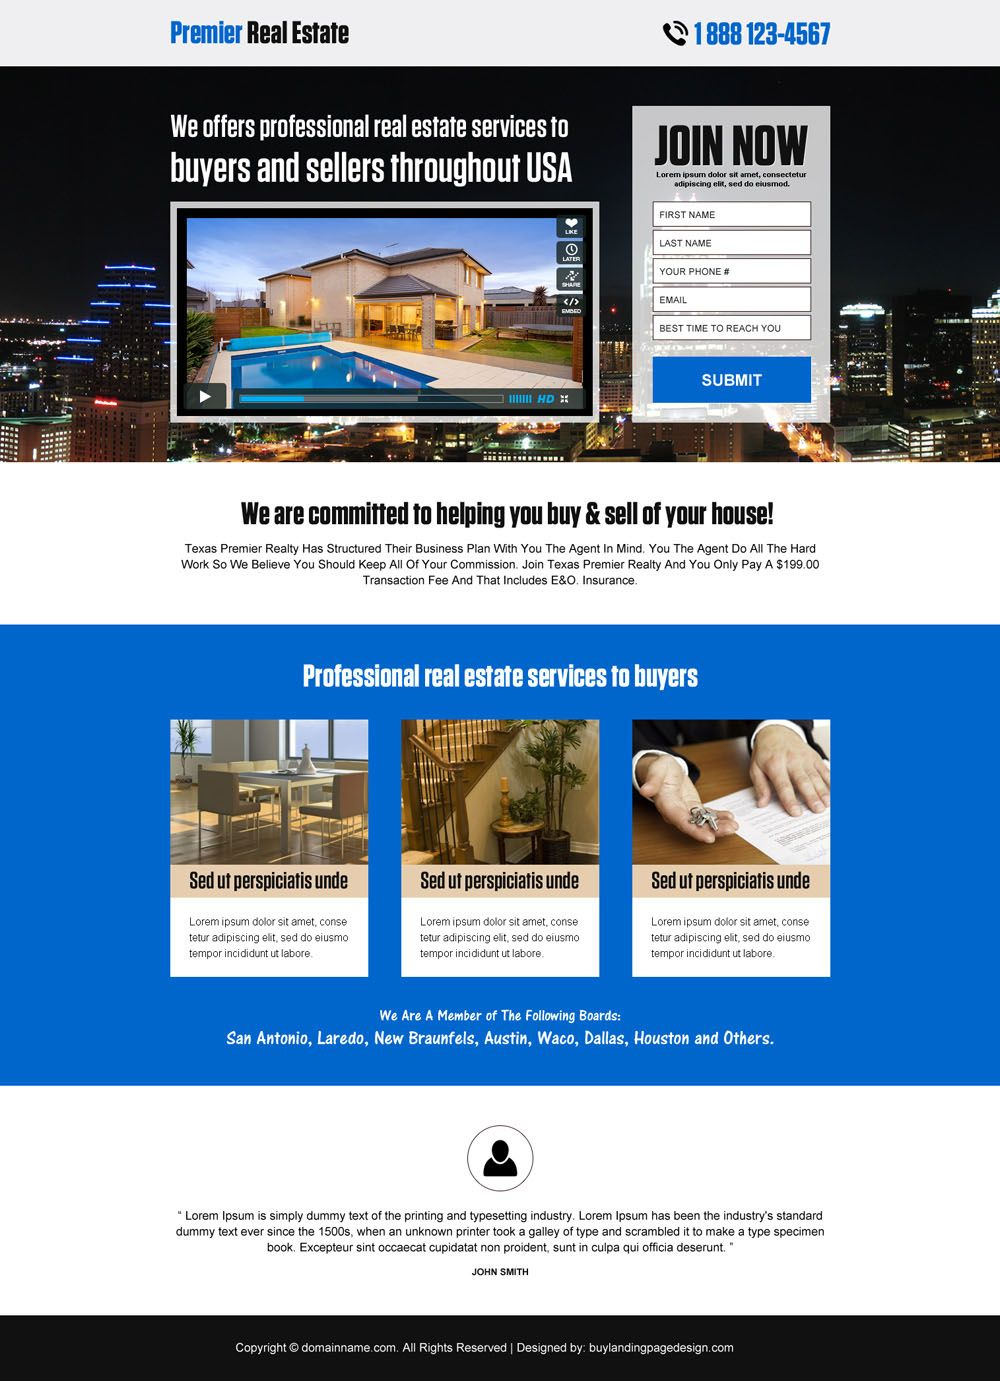 Premier Real Estate Responsive Landing Page Design Real Estate Landing Pages Real Estate Website Real Estate Leads